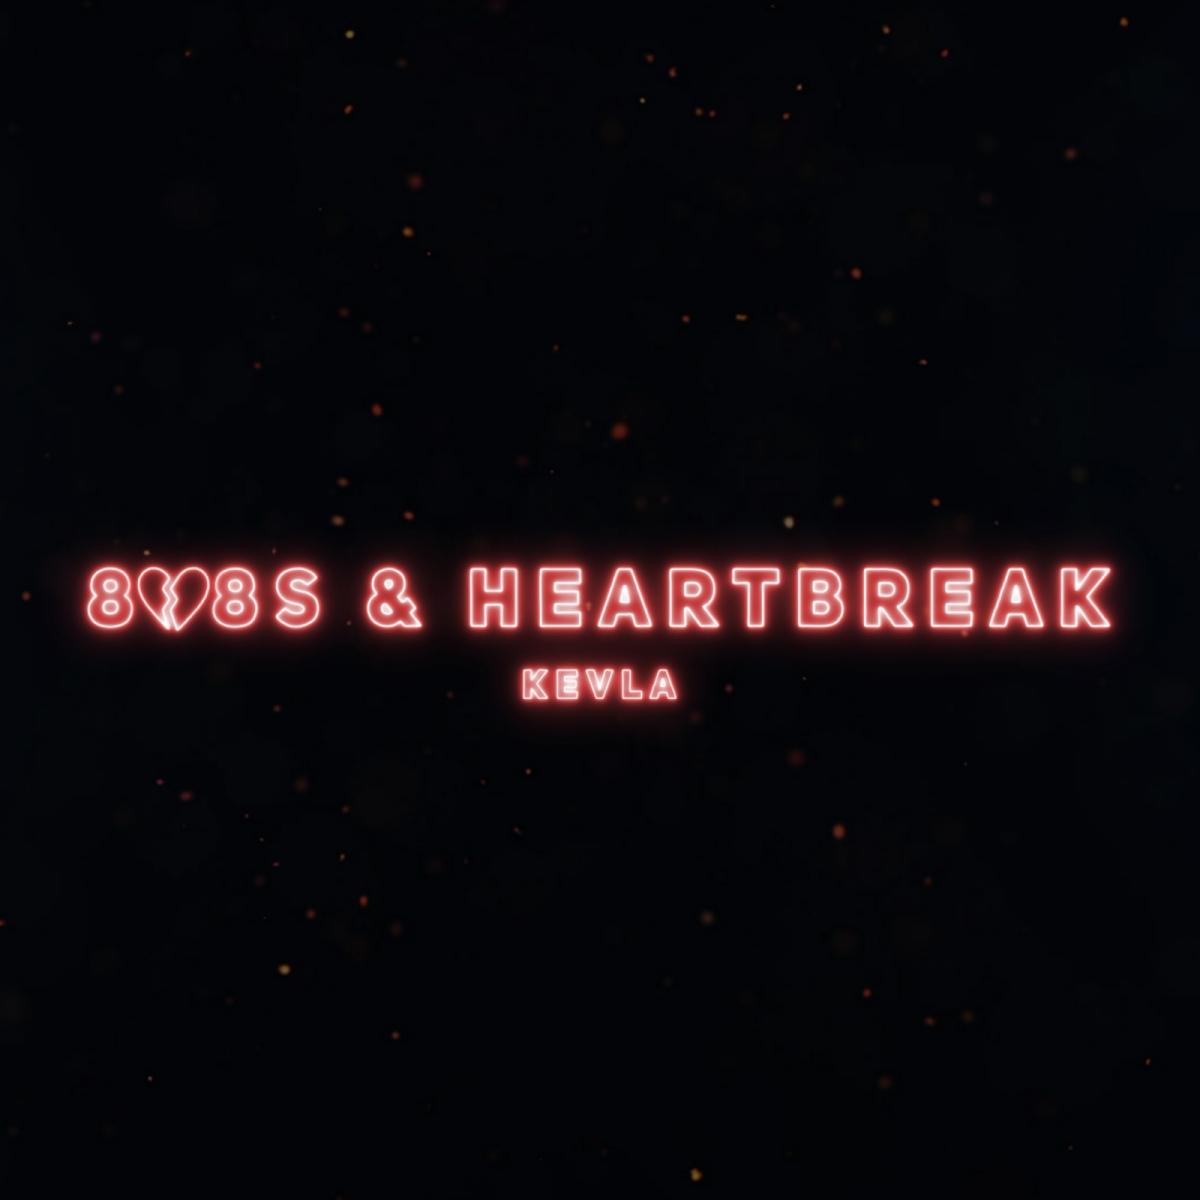 Upcoming: KEVLA - 808s & Heartbreak